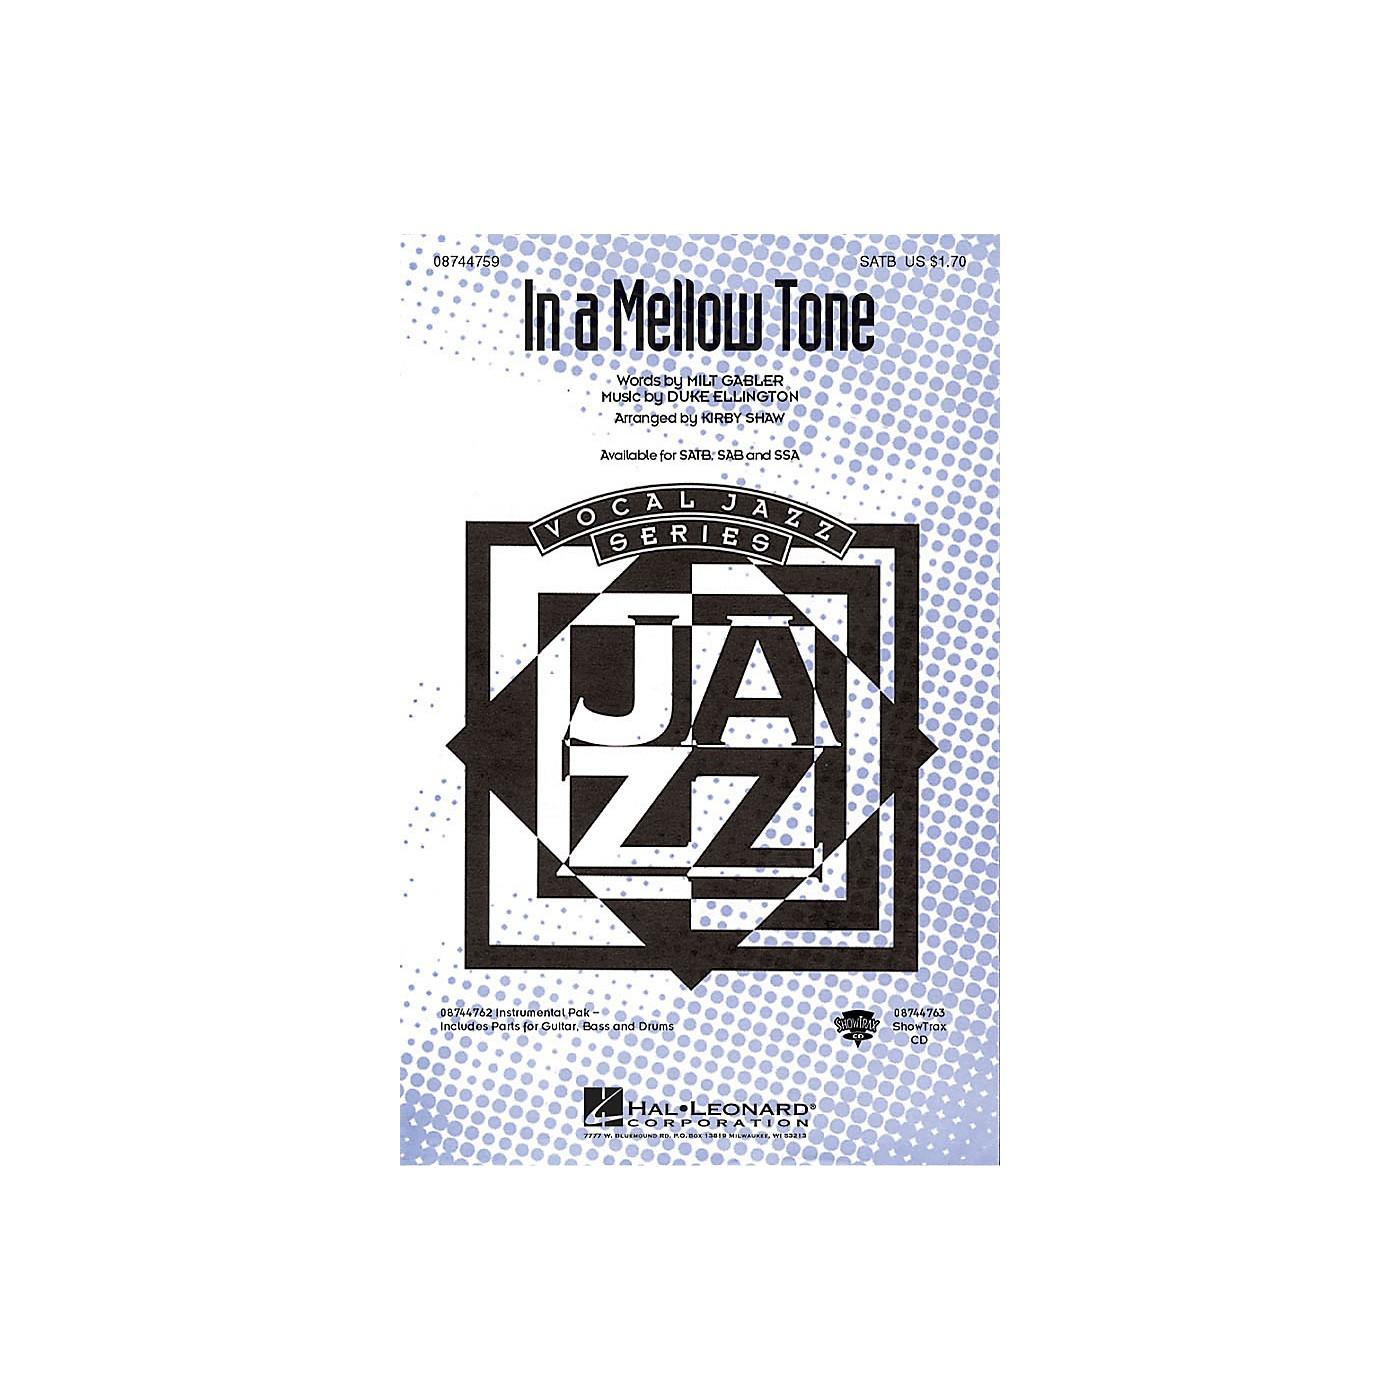 Hal Leonard In a Mellow Tone IPAKR by Duke Ellington Arranged by Kirby Shaw thumbnail